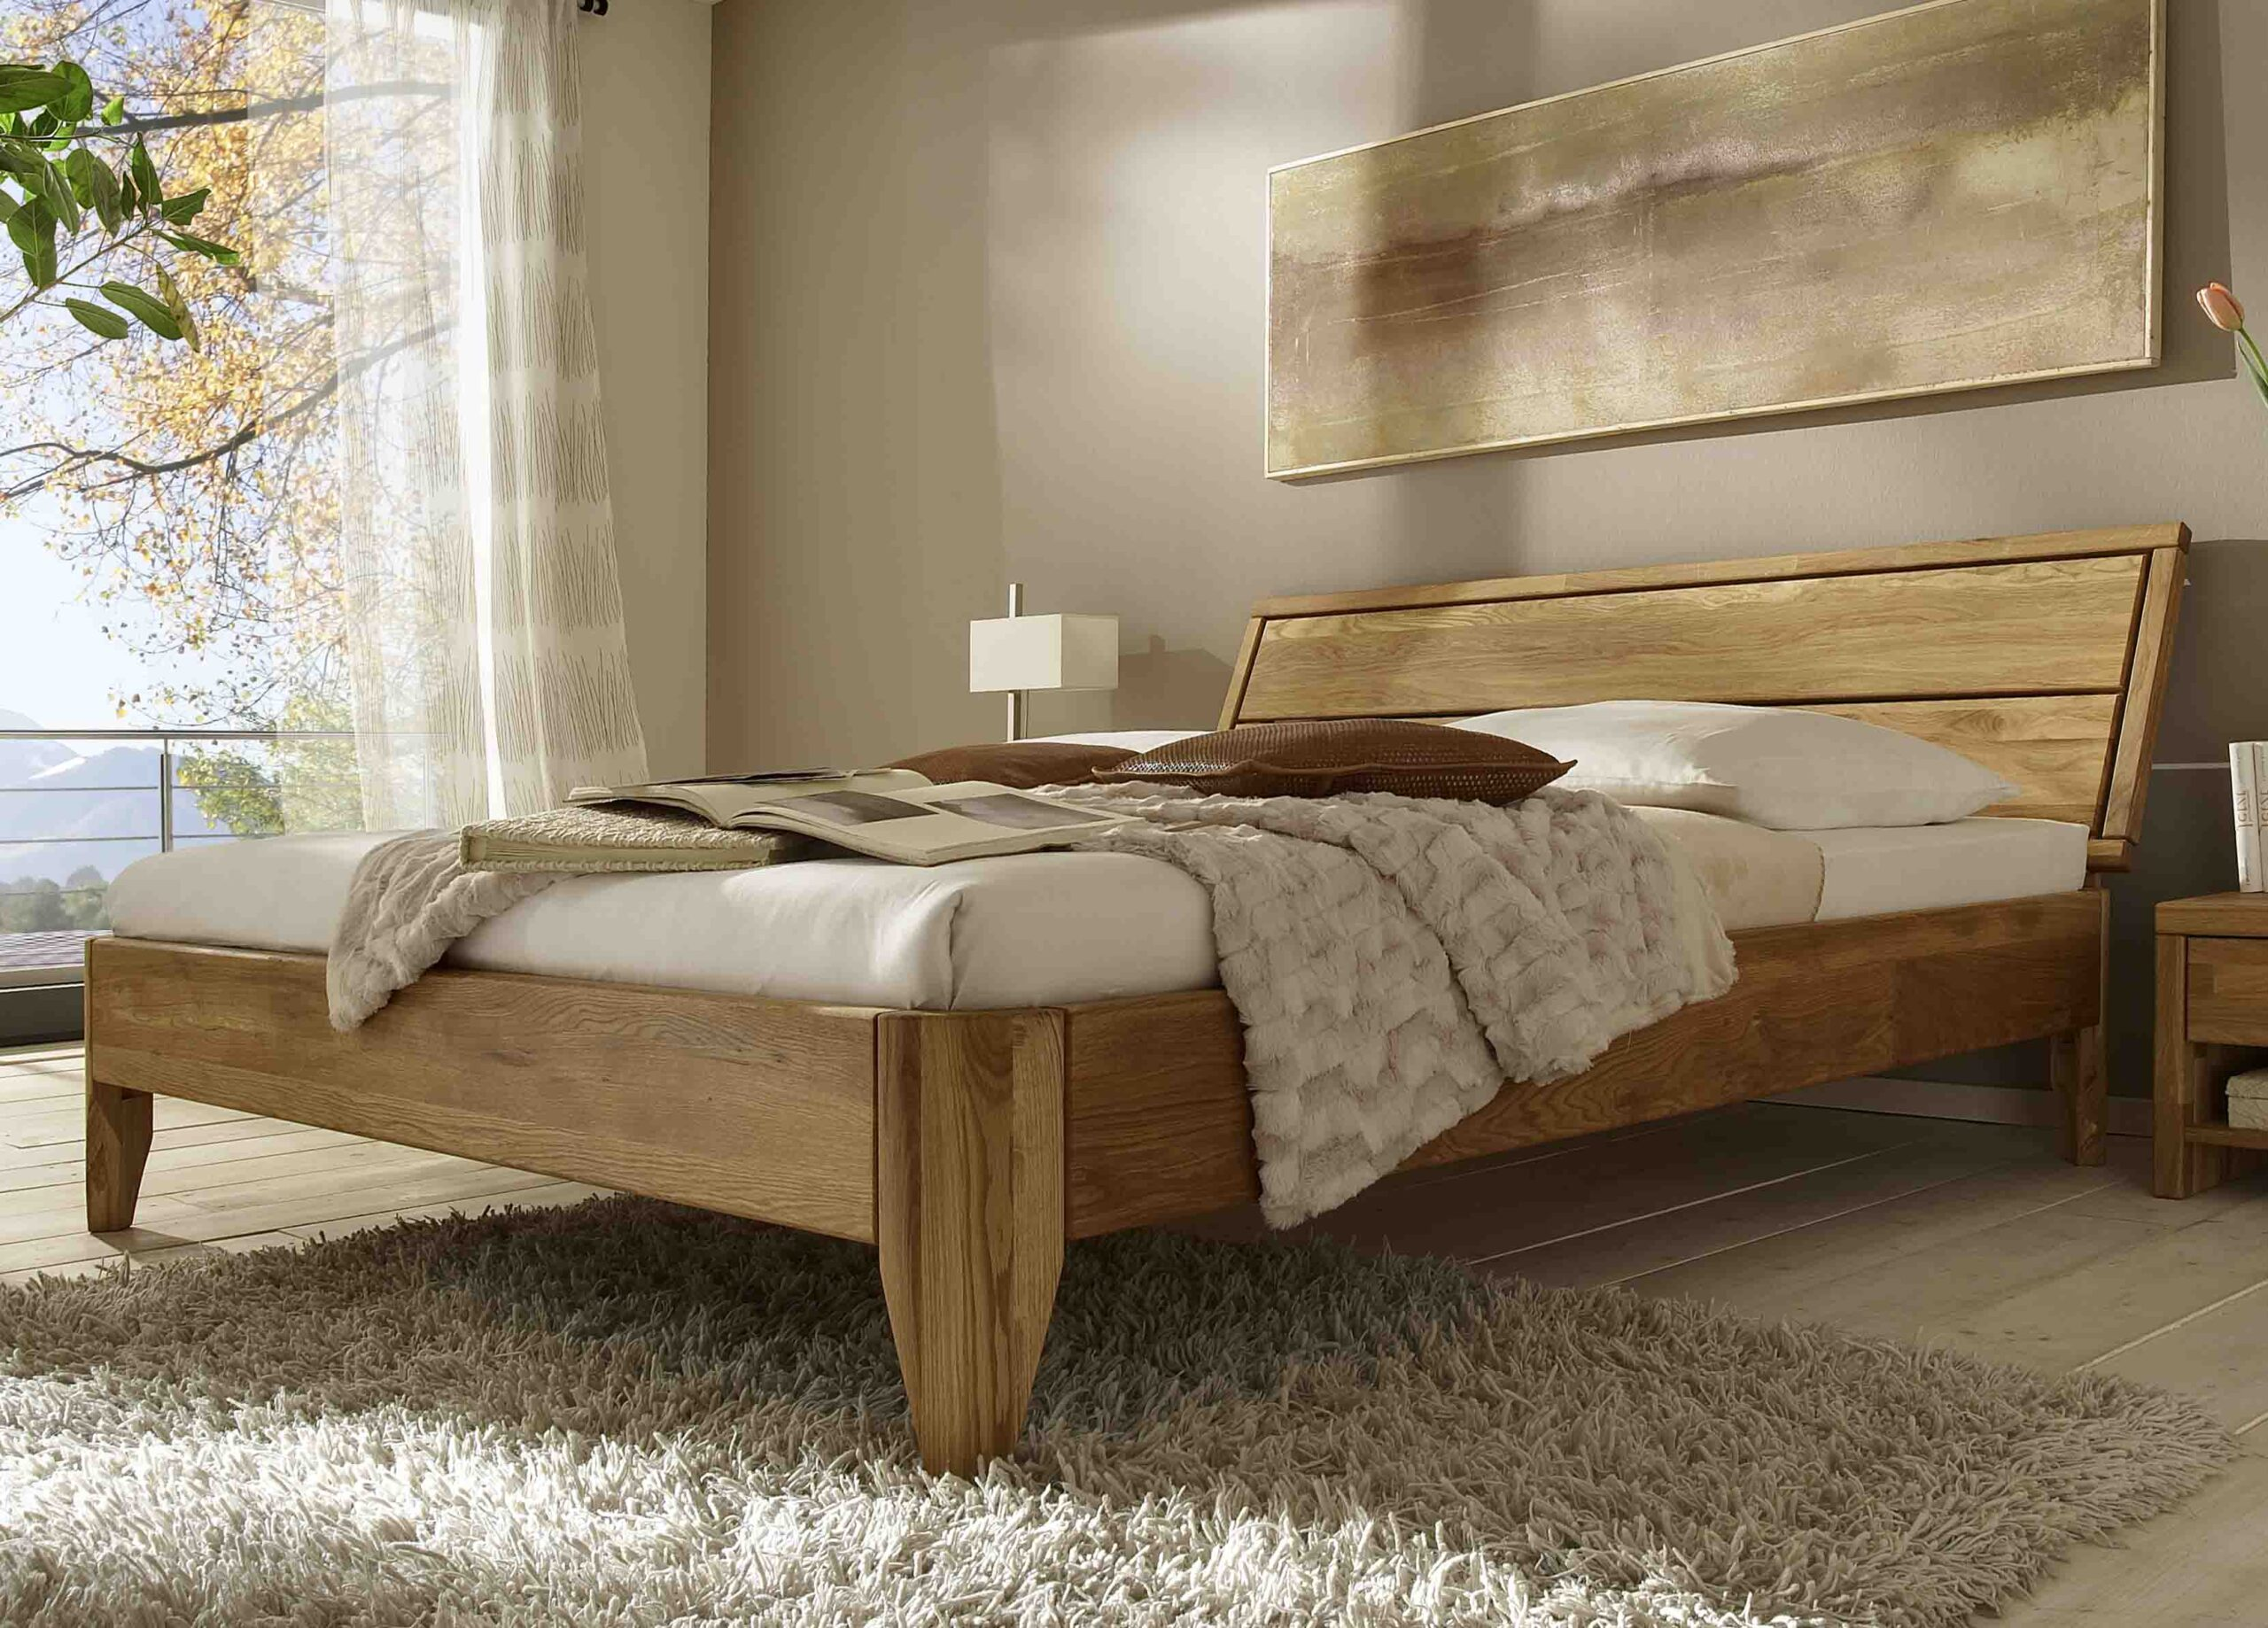 Full Size of Bett 200x220 Komforthöhe Schubladenbett Easy Sleep In Kiefer Von Tjrnbo Einzelbett Tojo V 200x200 Prinzessin 180x200 Schwarz 90x200 Paradies Betten Wohnzimmer Bett 200x220 Komforthöhe